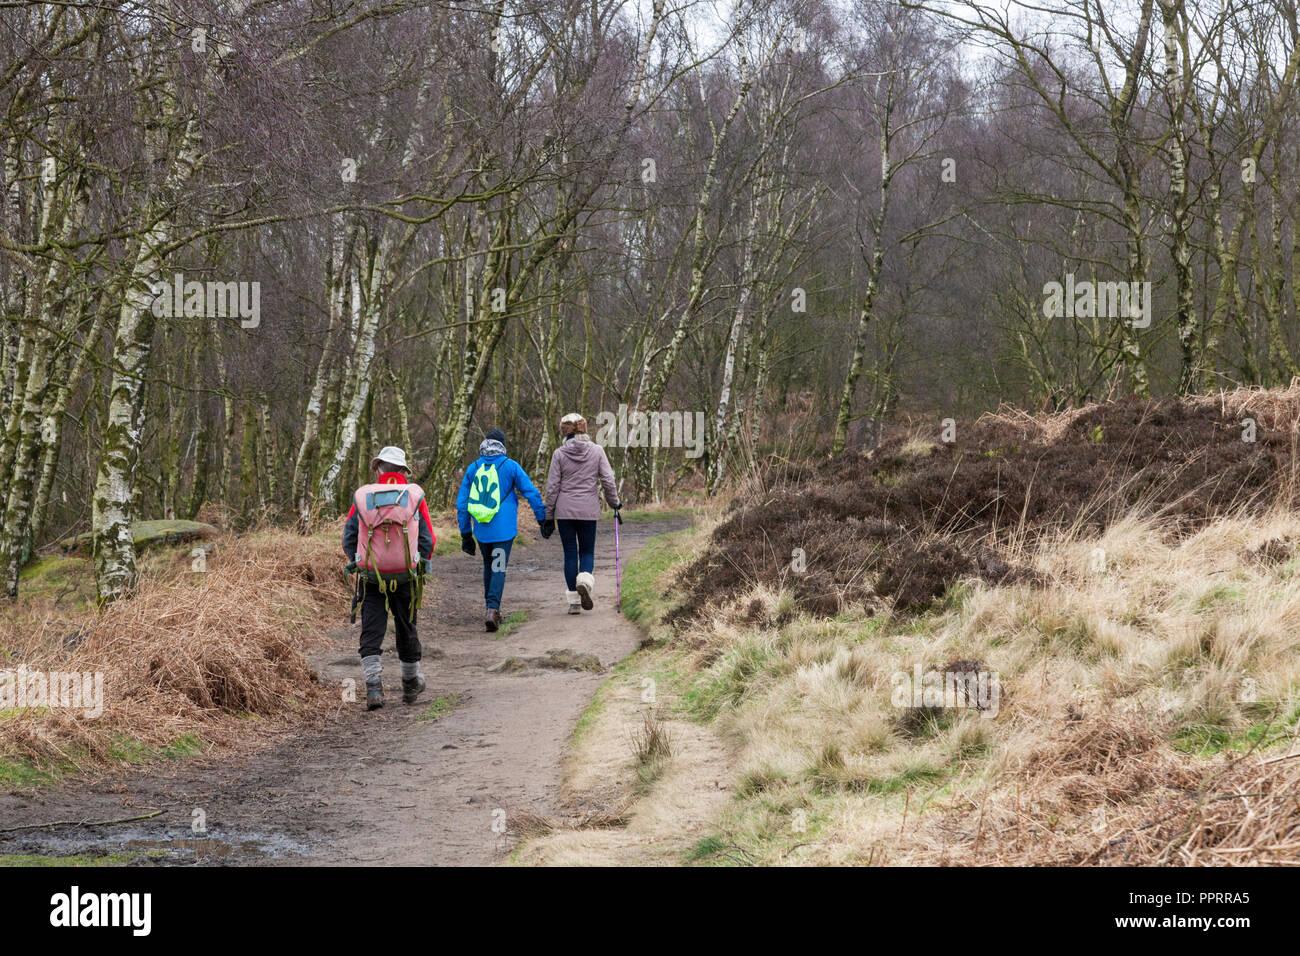 Walkers in Winter walking by woodland on Froggatt Edge, Derbyshire, Peak District, England, UK - Stock Image